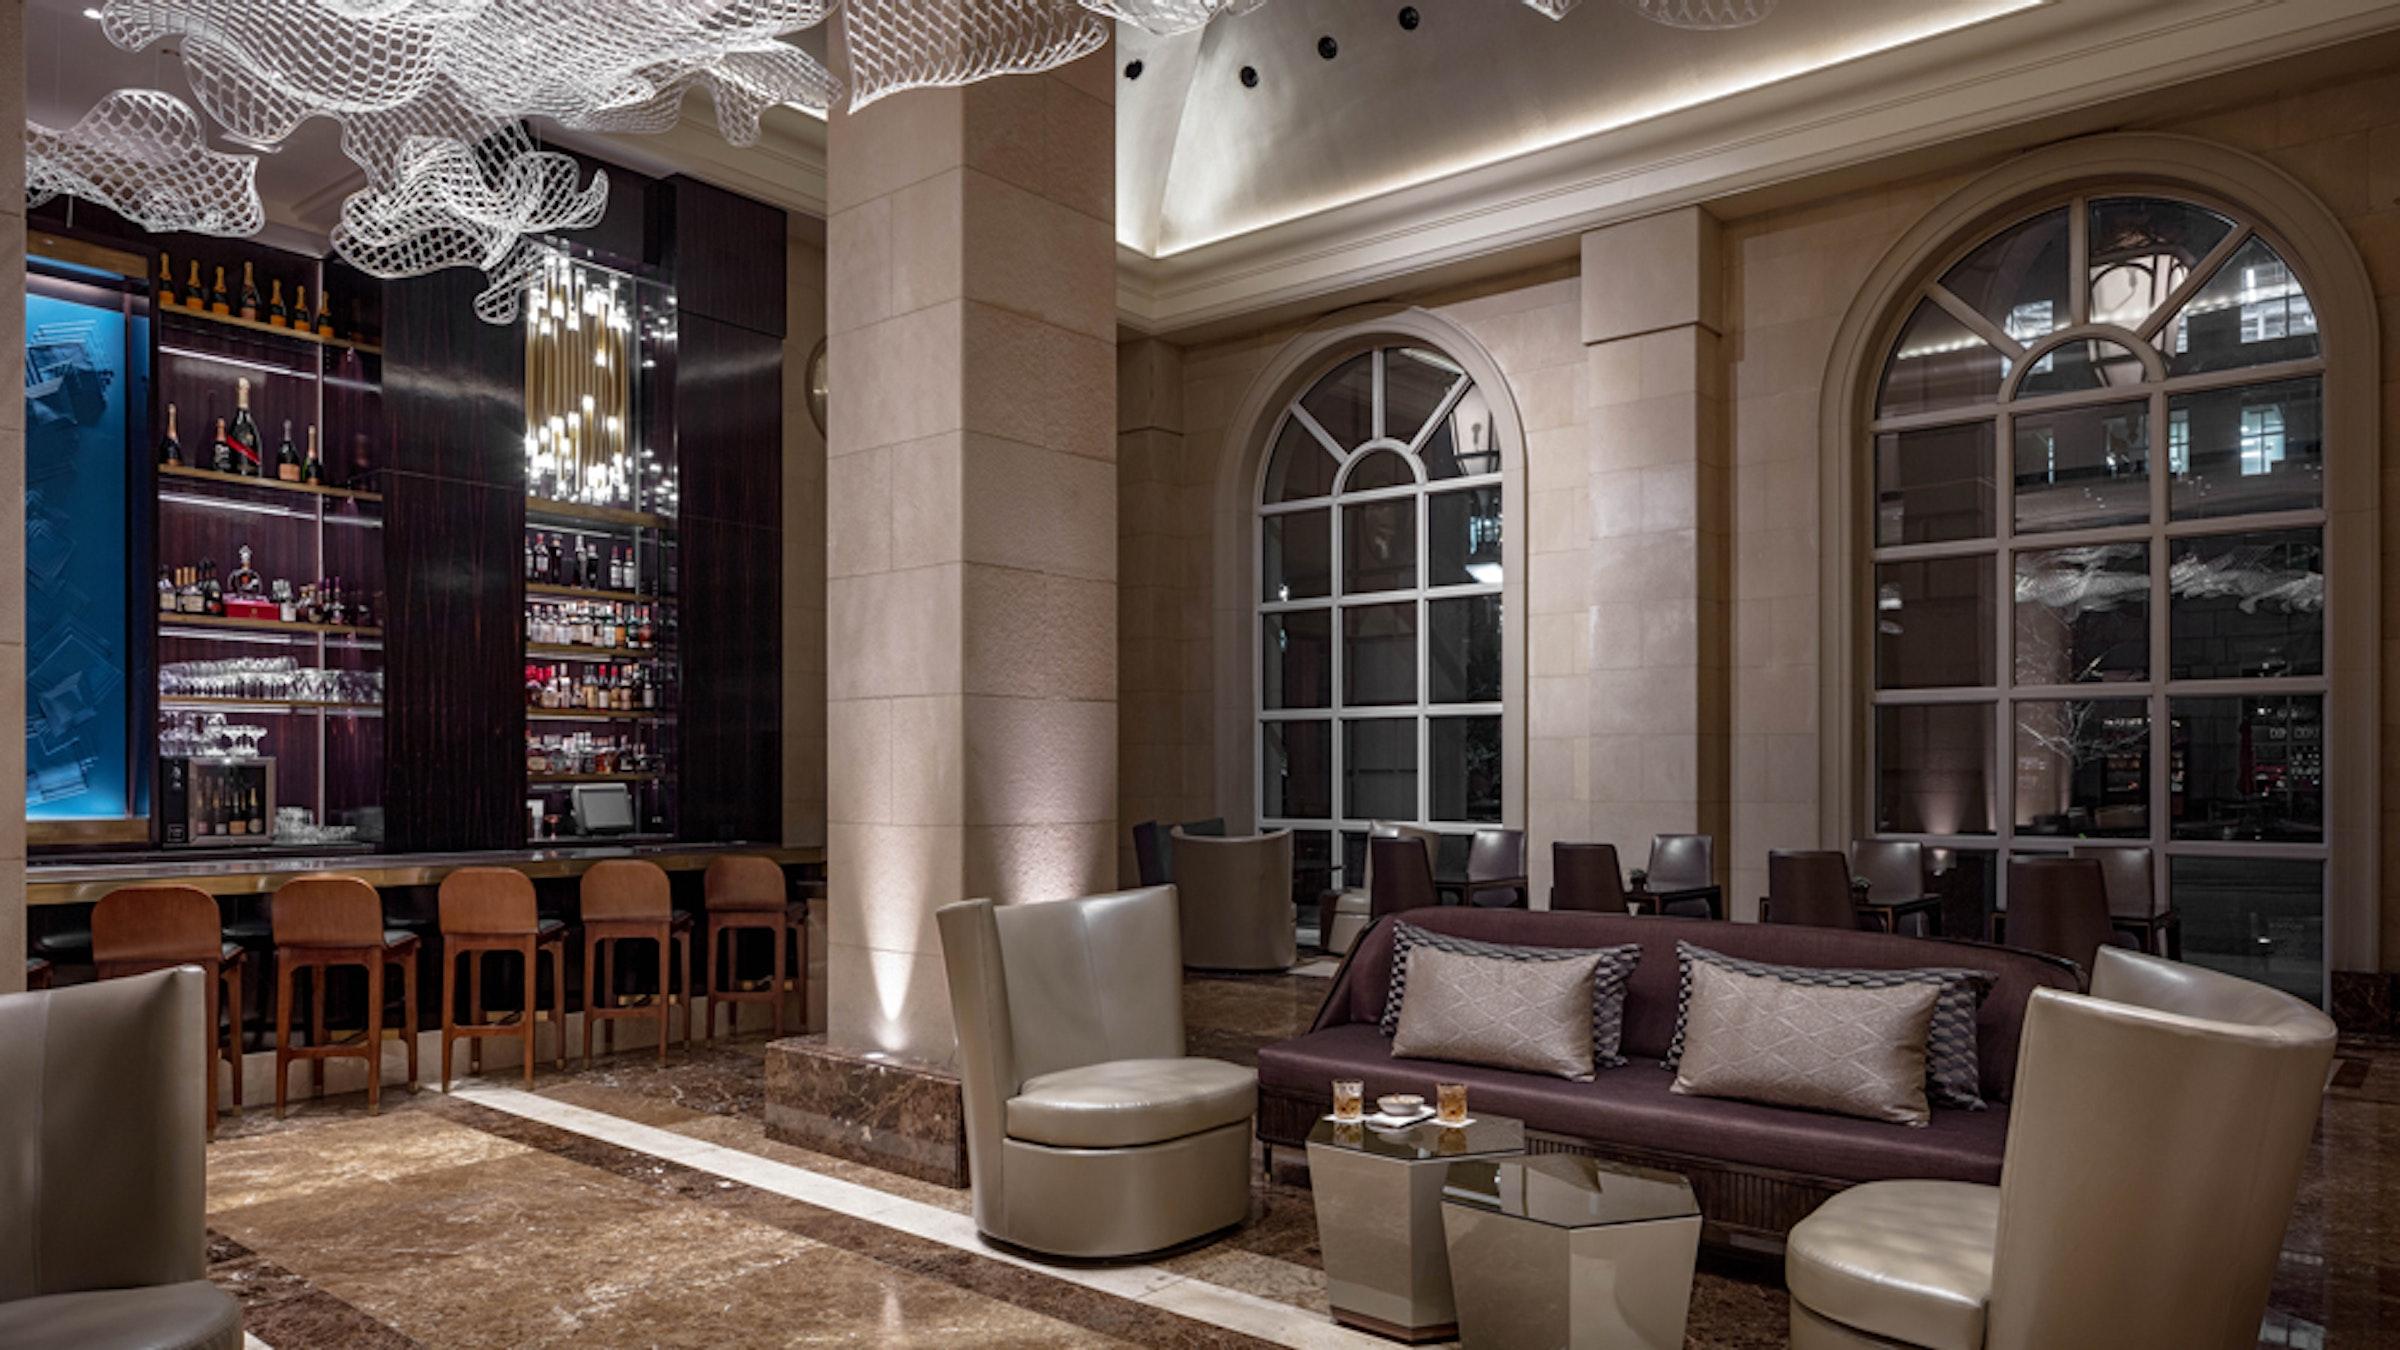 Hotel Crescent Court in Beyond Dallas